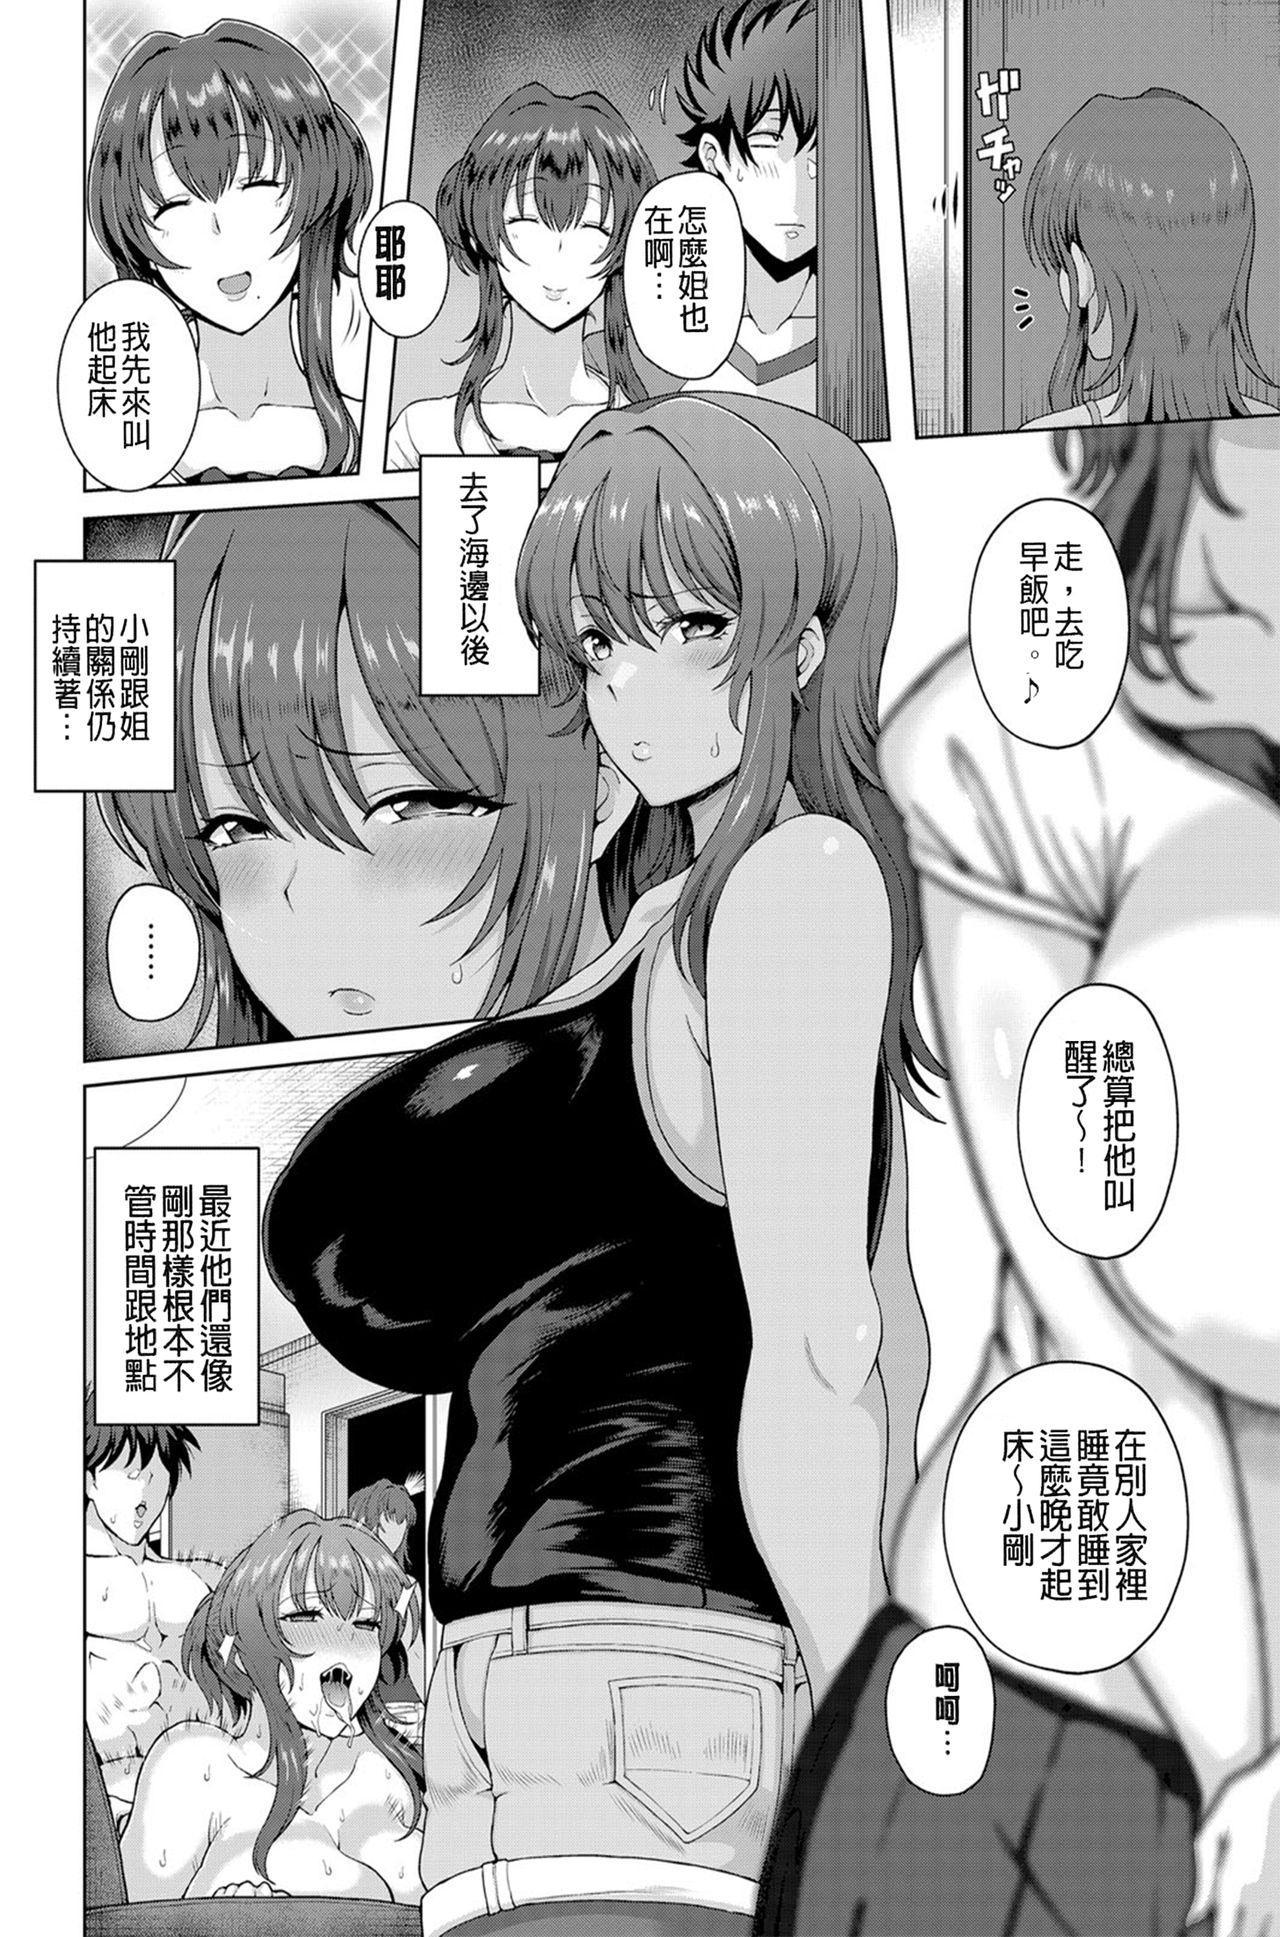 Juku Mesu - Erotic Mature Women 34